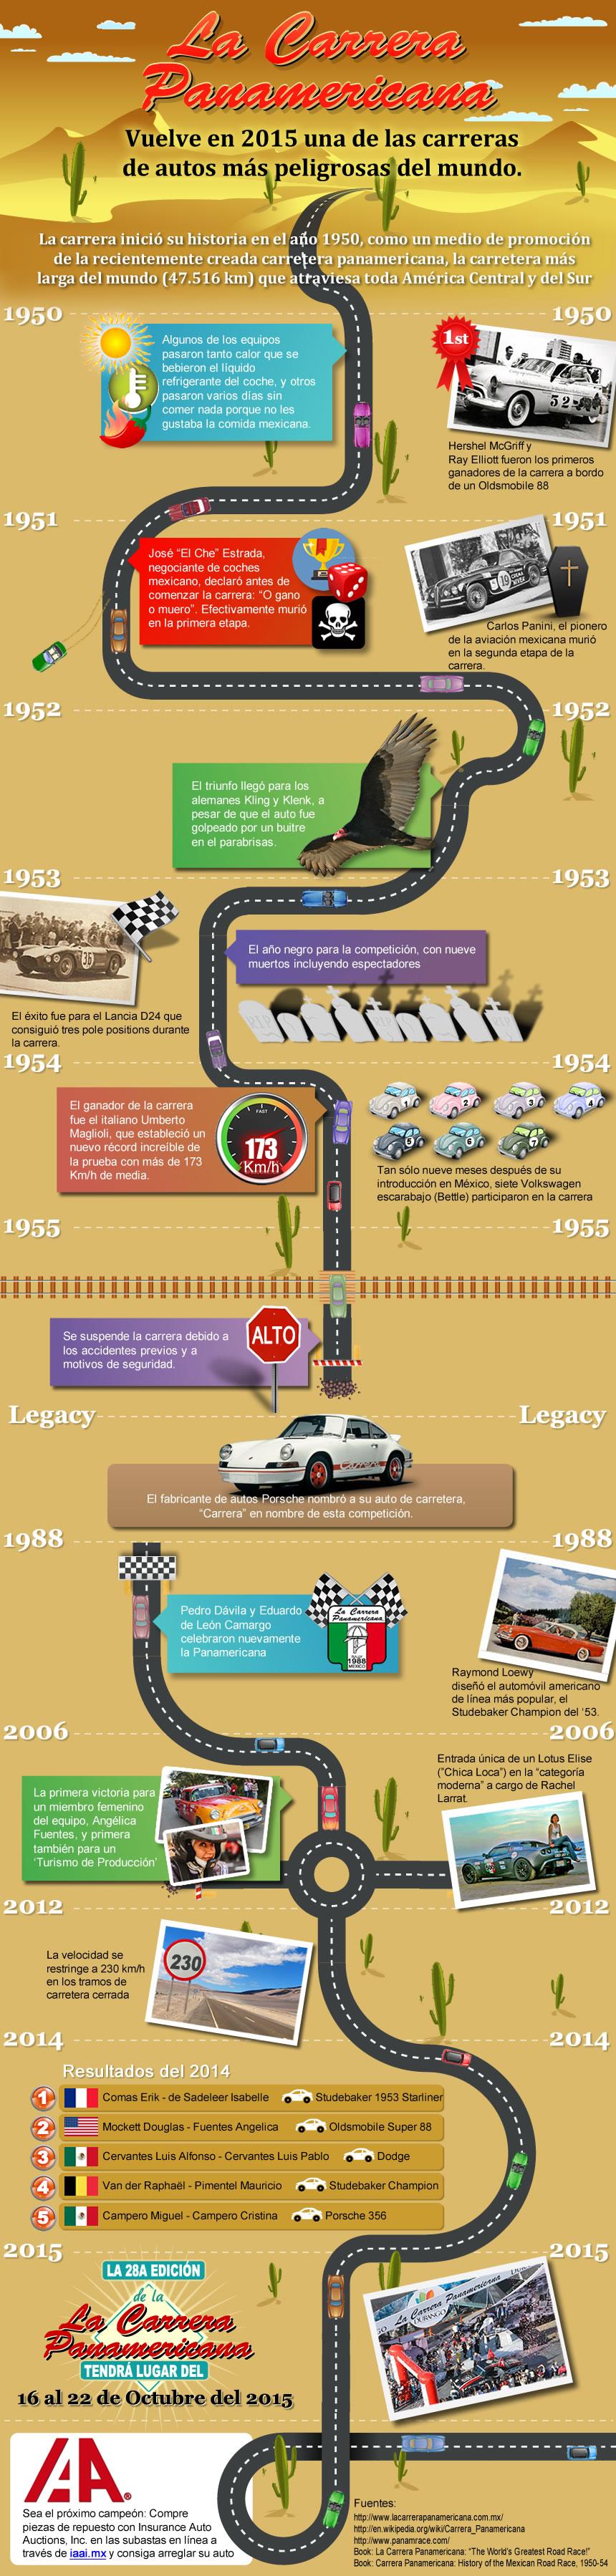 Infographic - La Carrera Panamericana